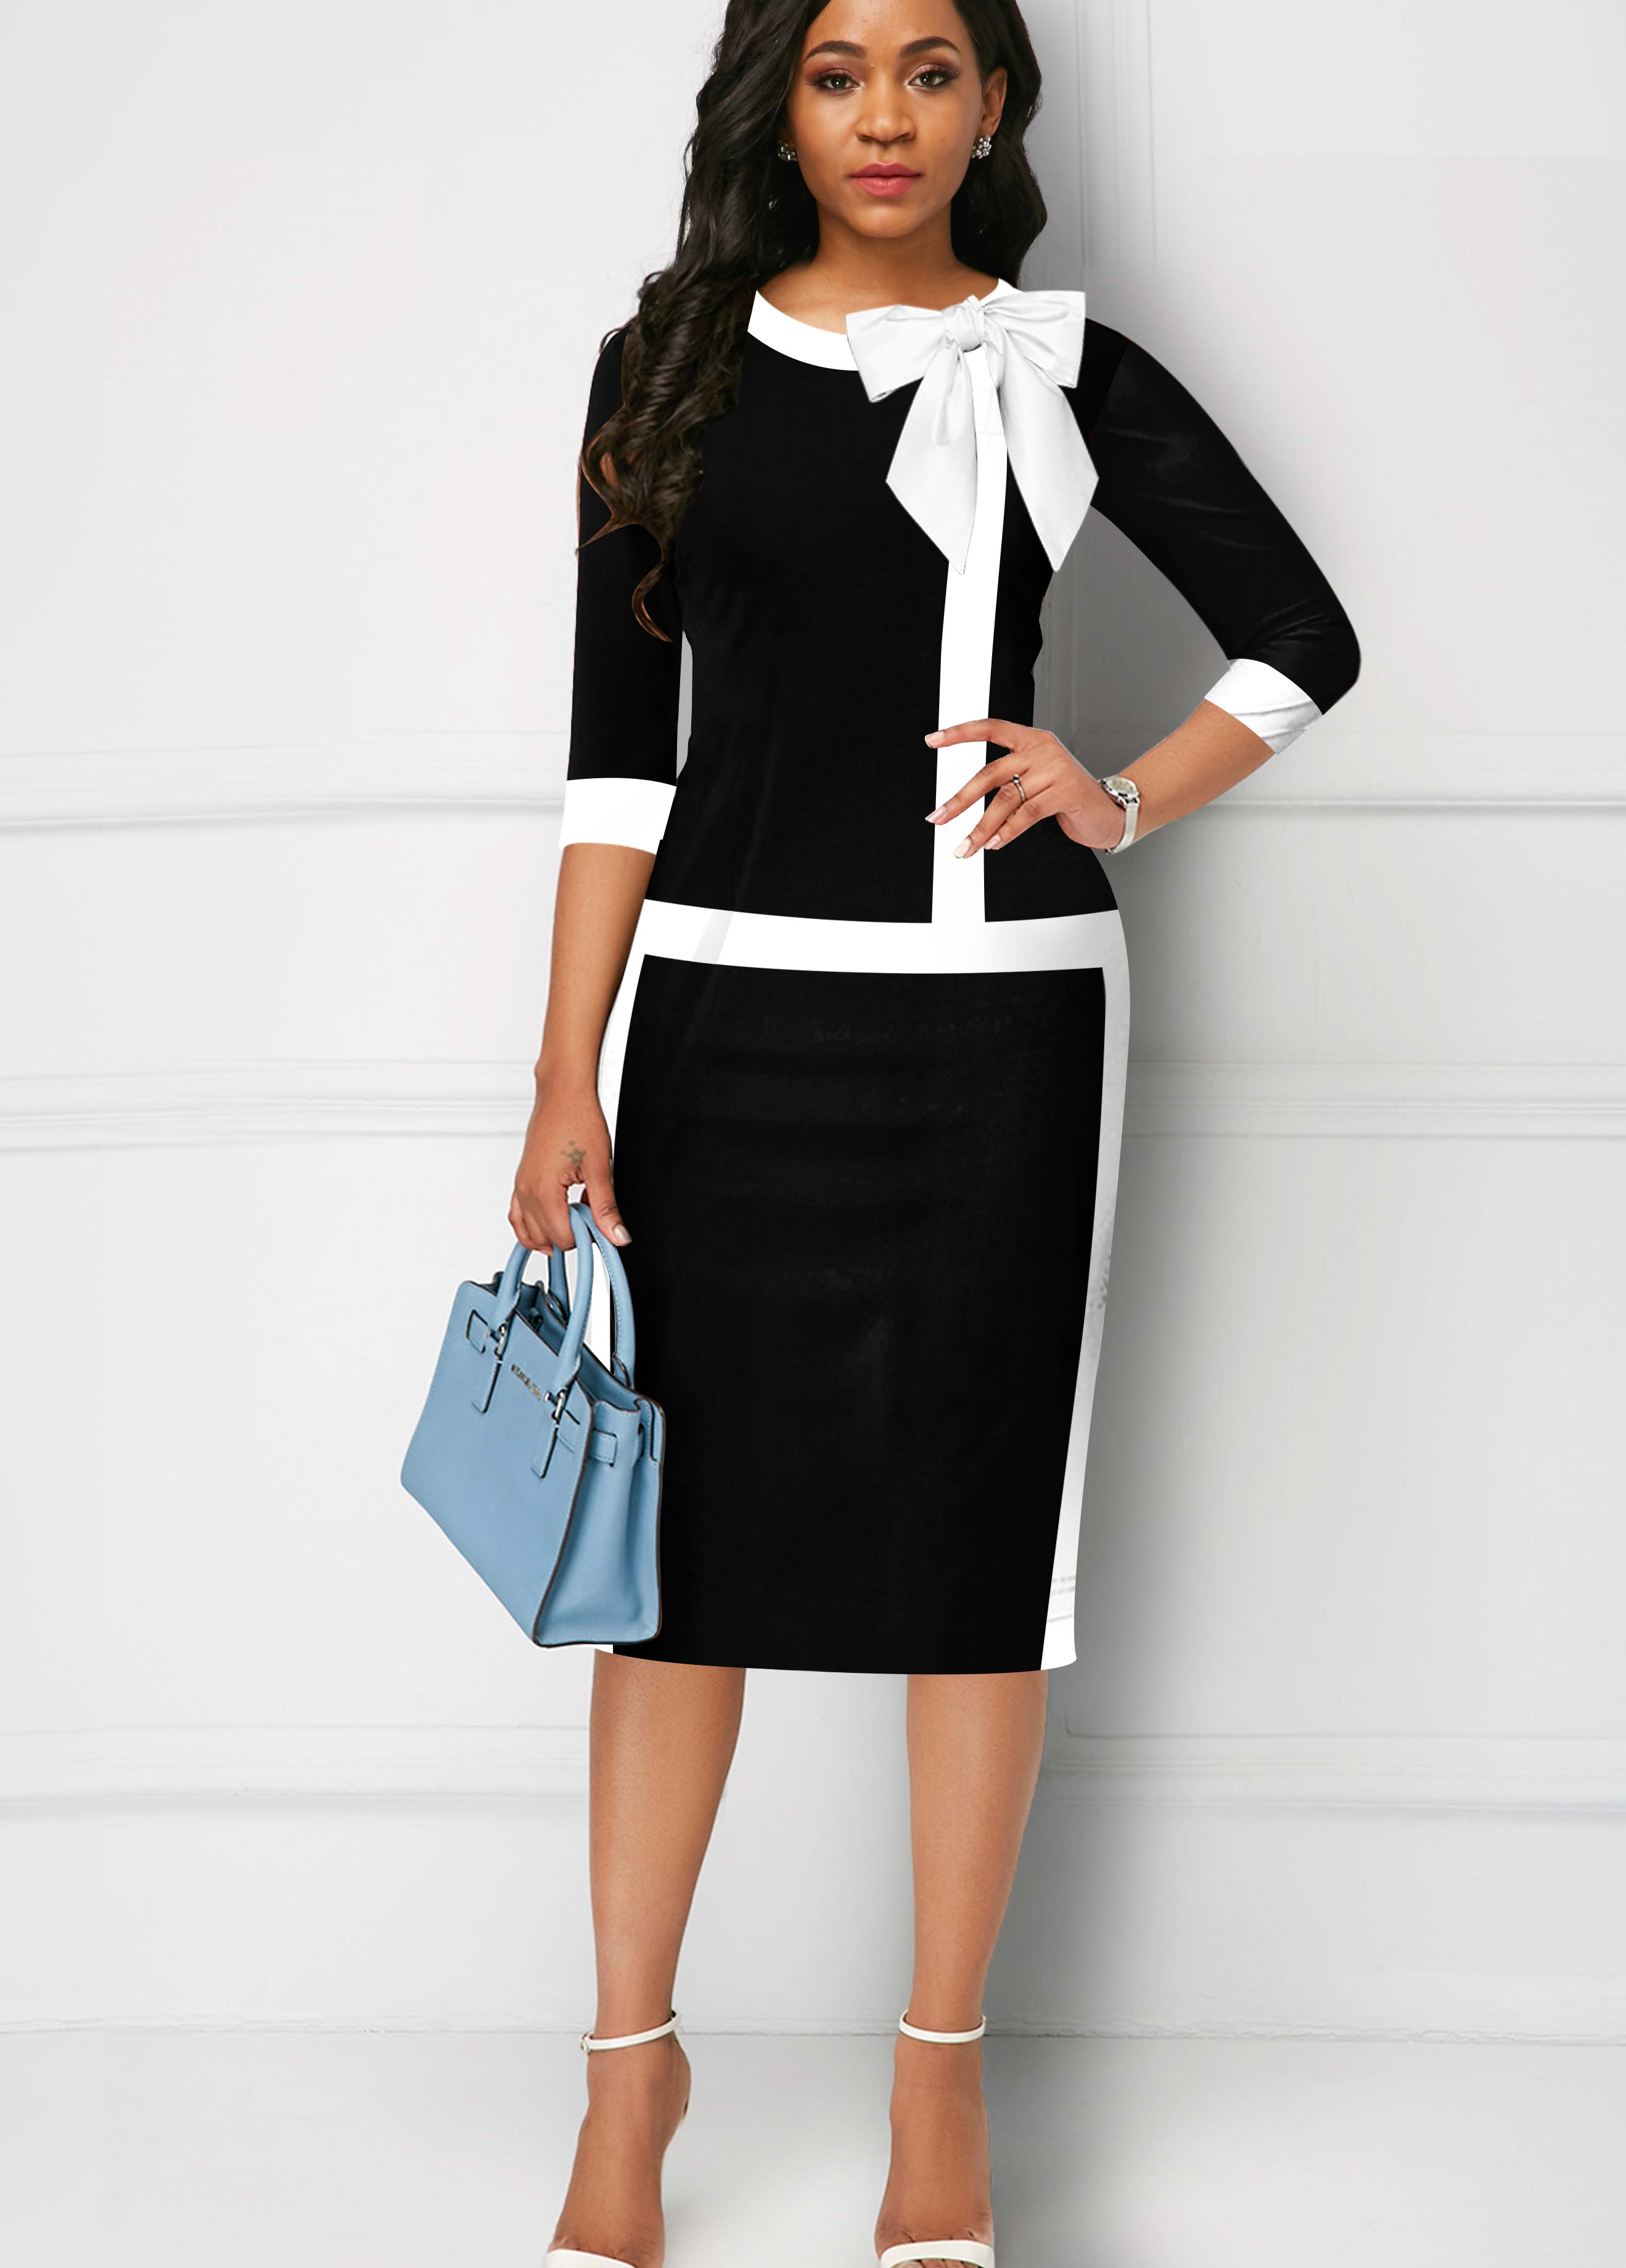 ROTITA Contrast Piping 3/4 Sleeve Bowknot Dress